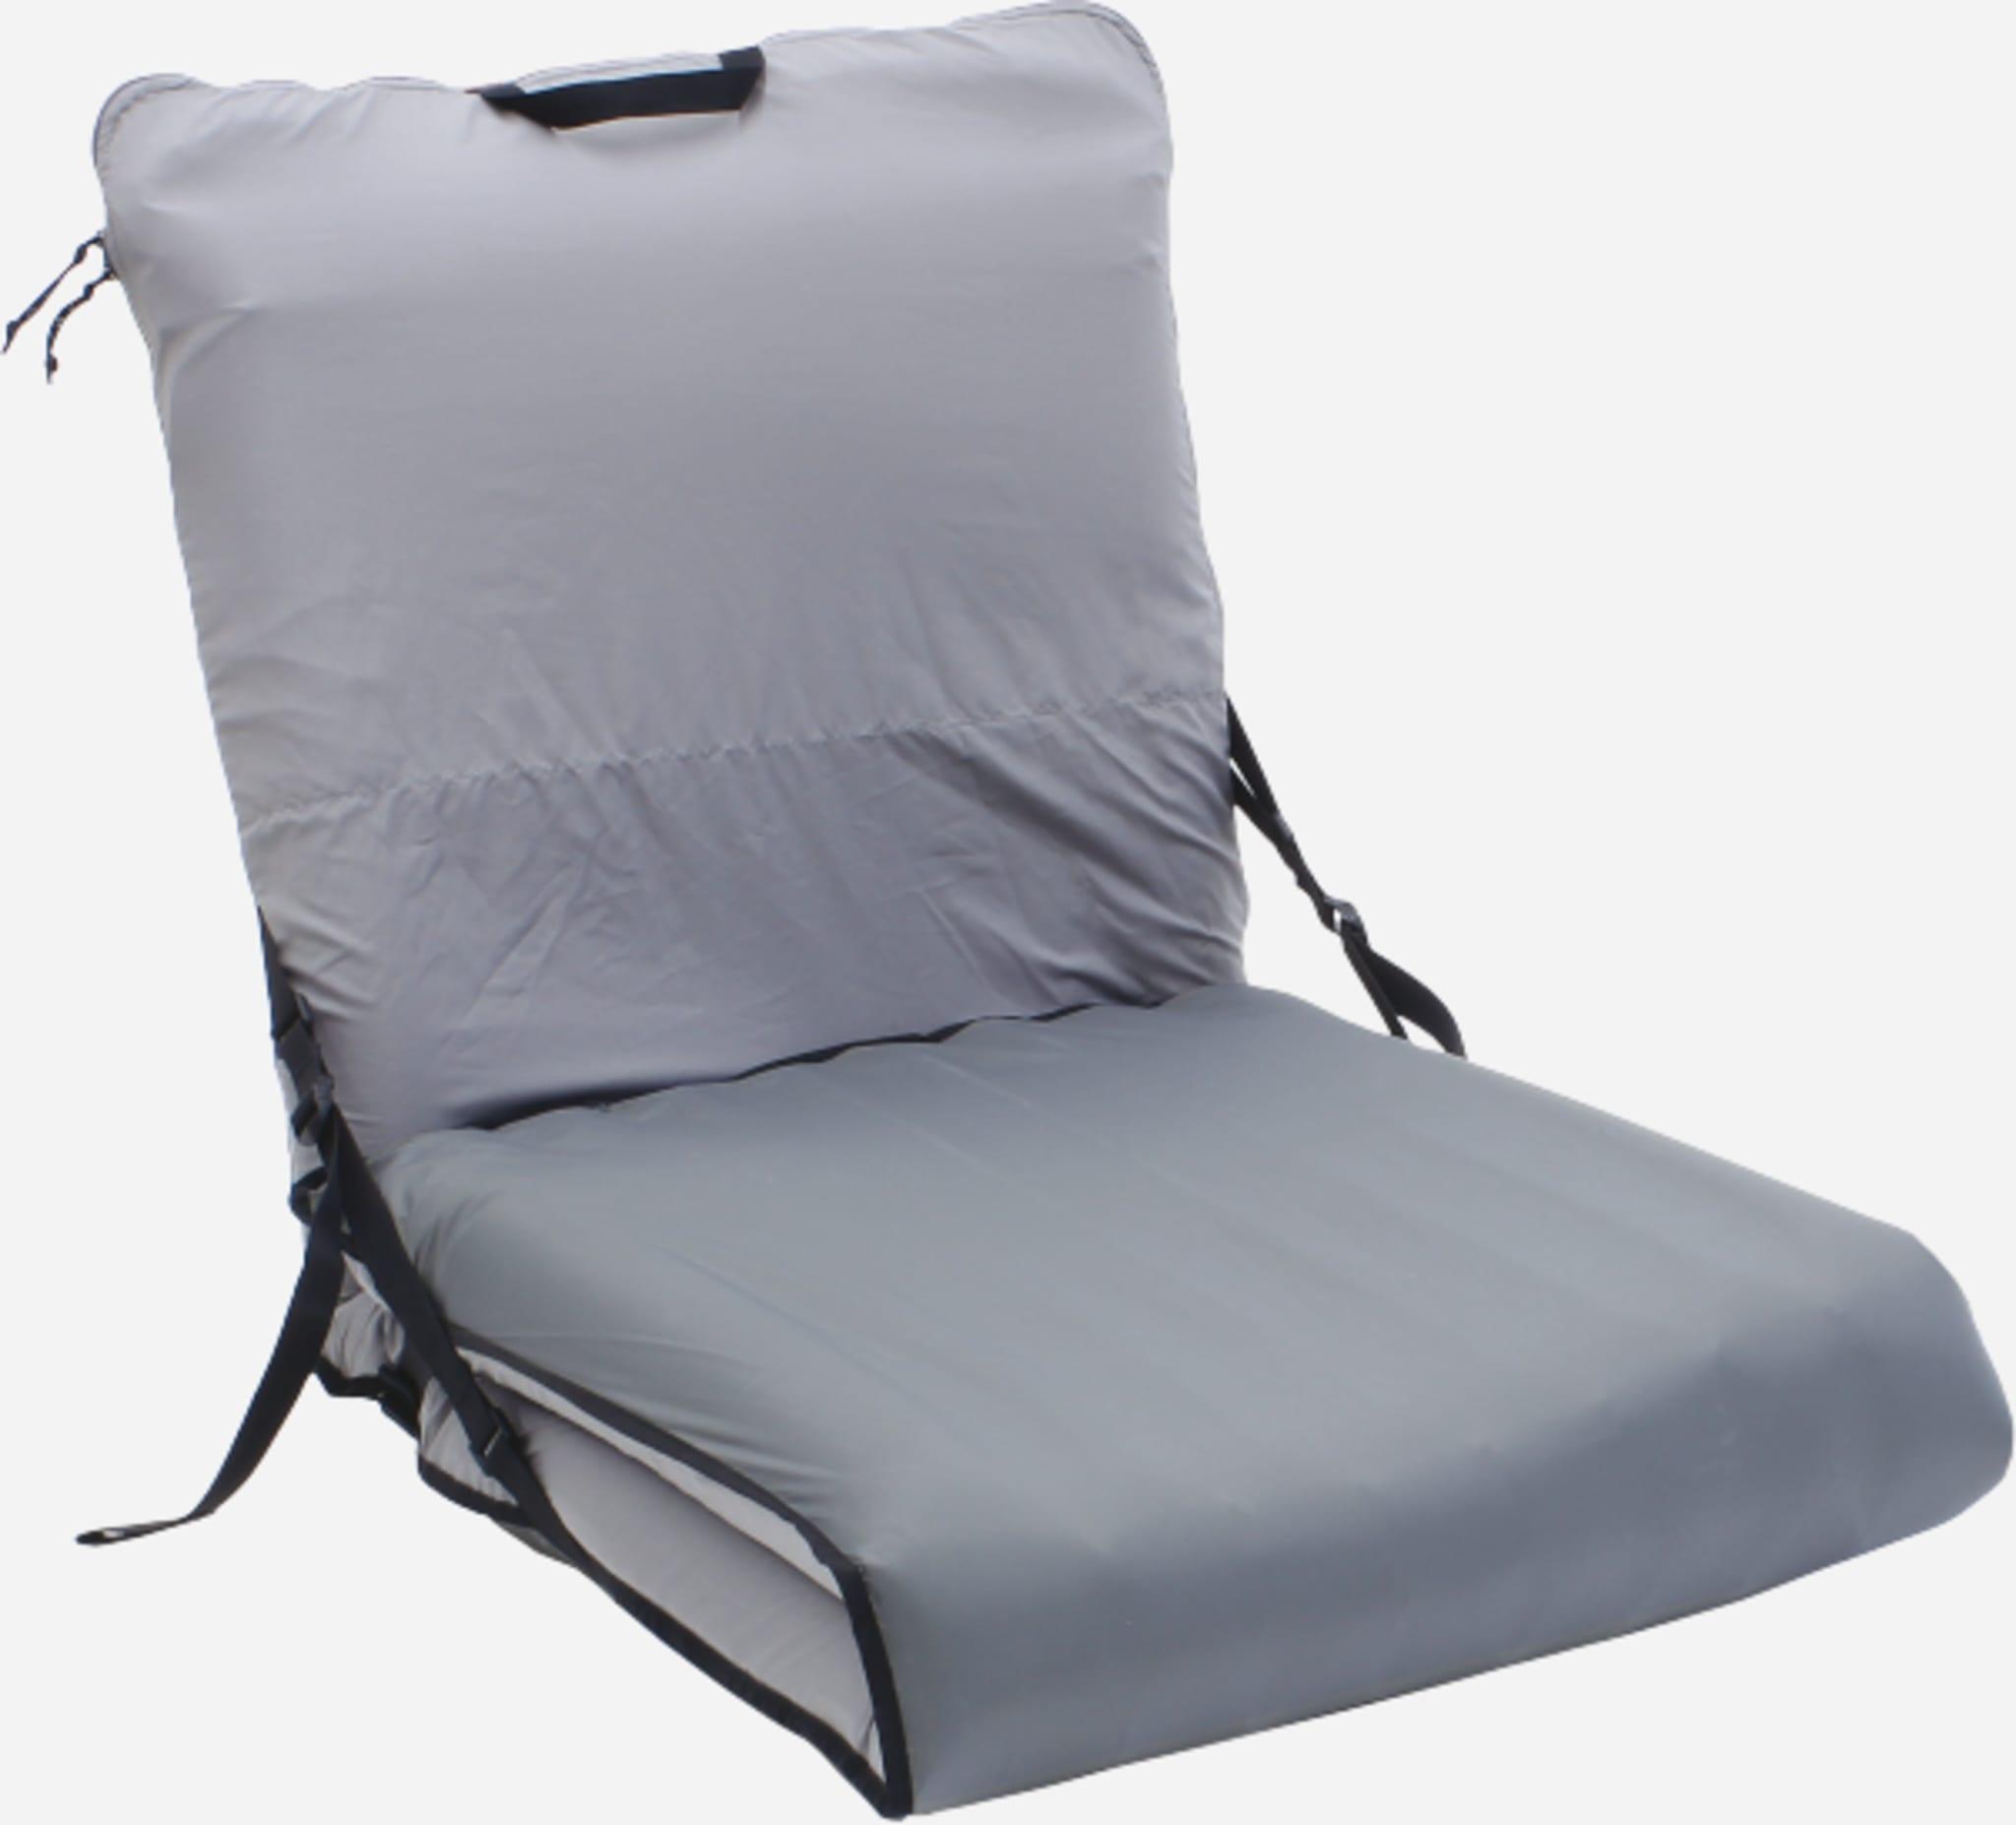 Genial sak som forvandler ditt Exped liggeunderlag til en komfortabel stol.